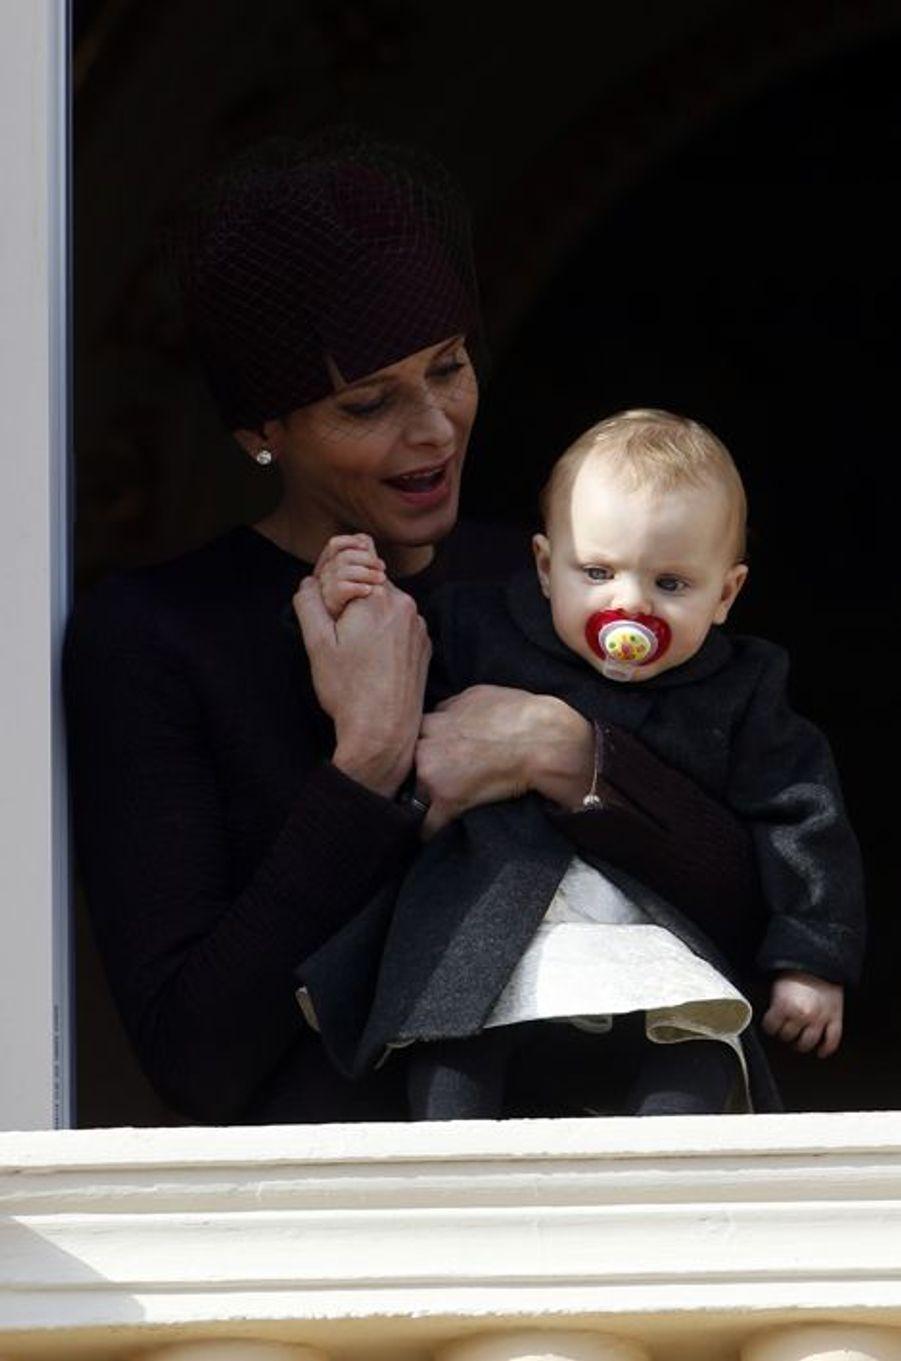 La princesse Charlène de Monaco avec la princesse Gabriella à Monaco, le 19 novembre 2015